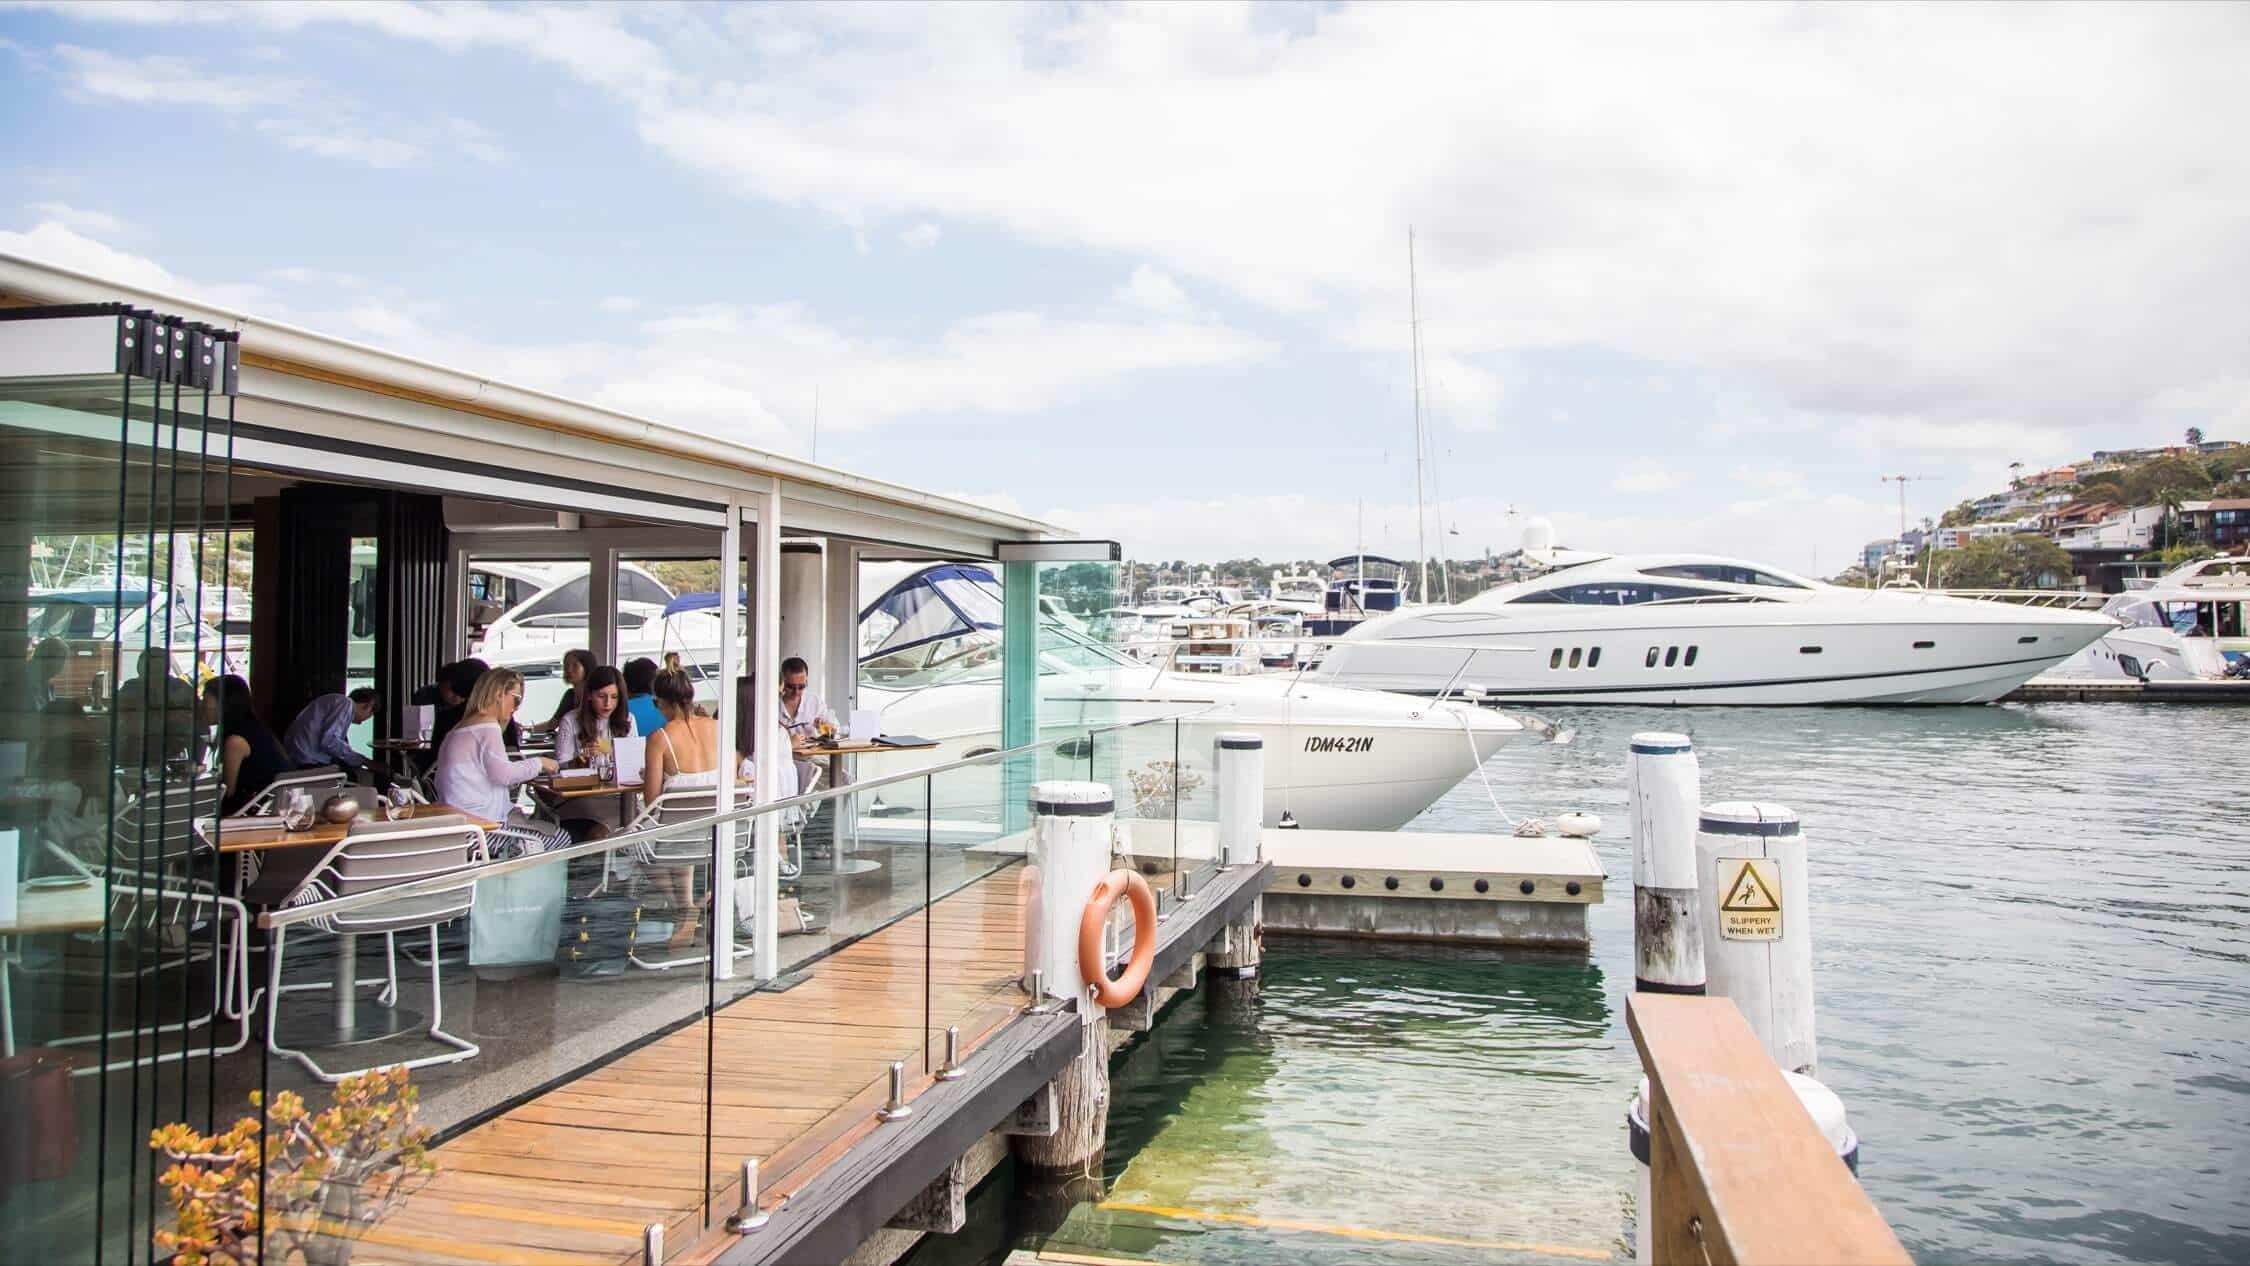 Waterfront Restaurant, Sydney, Australia